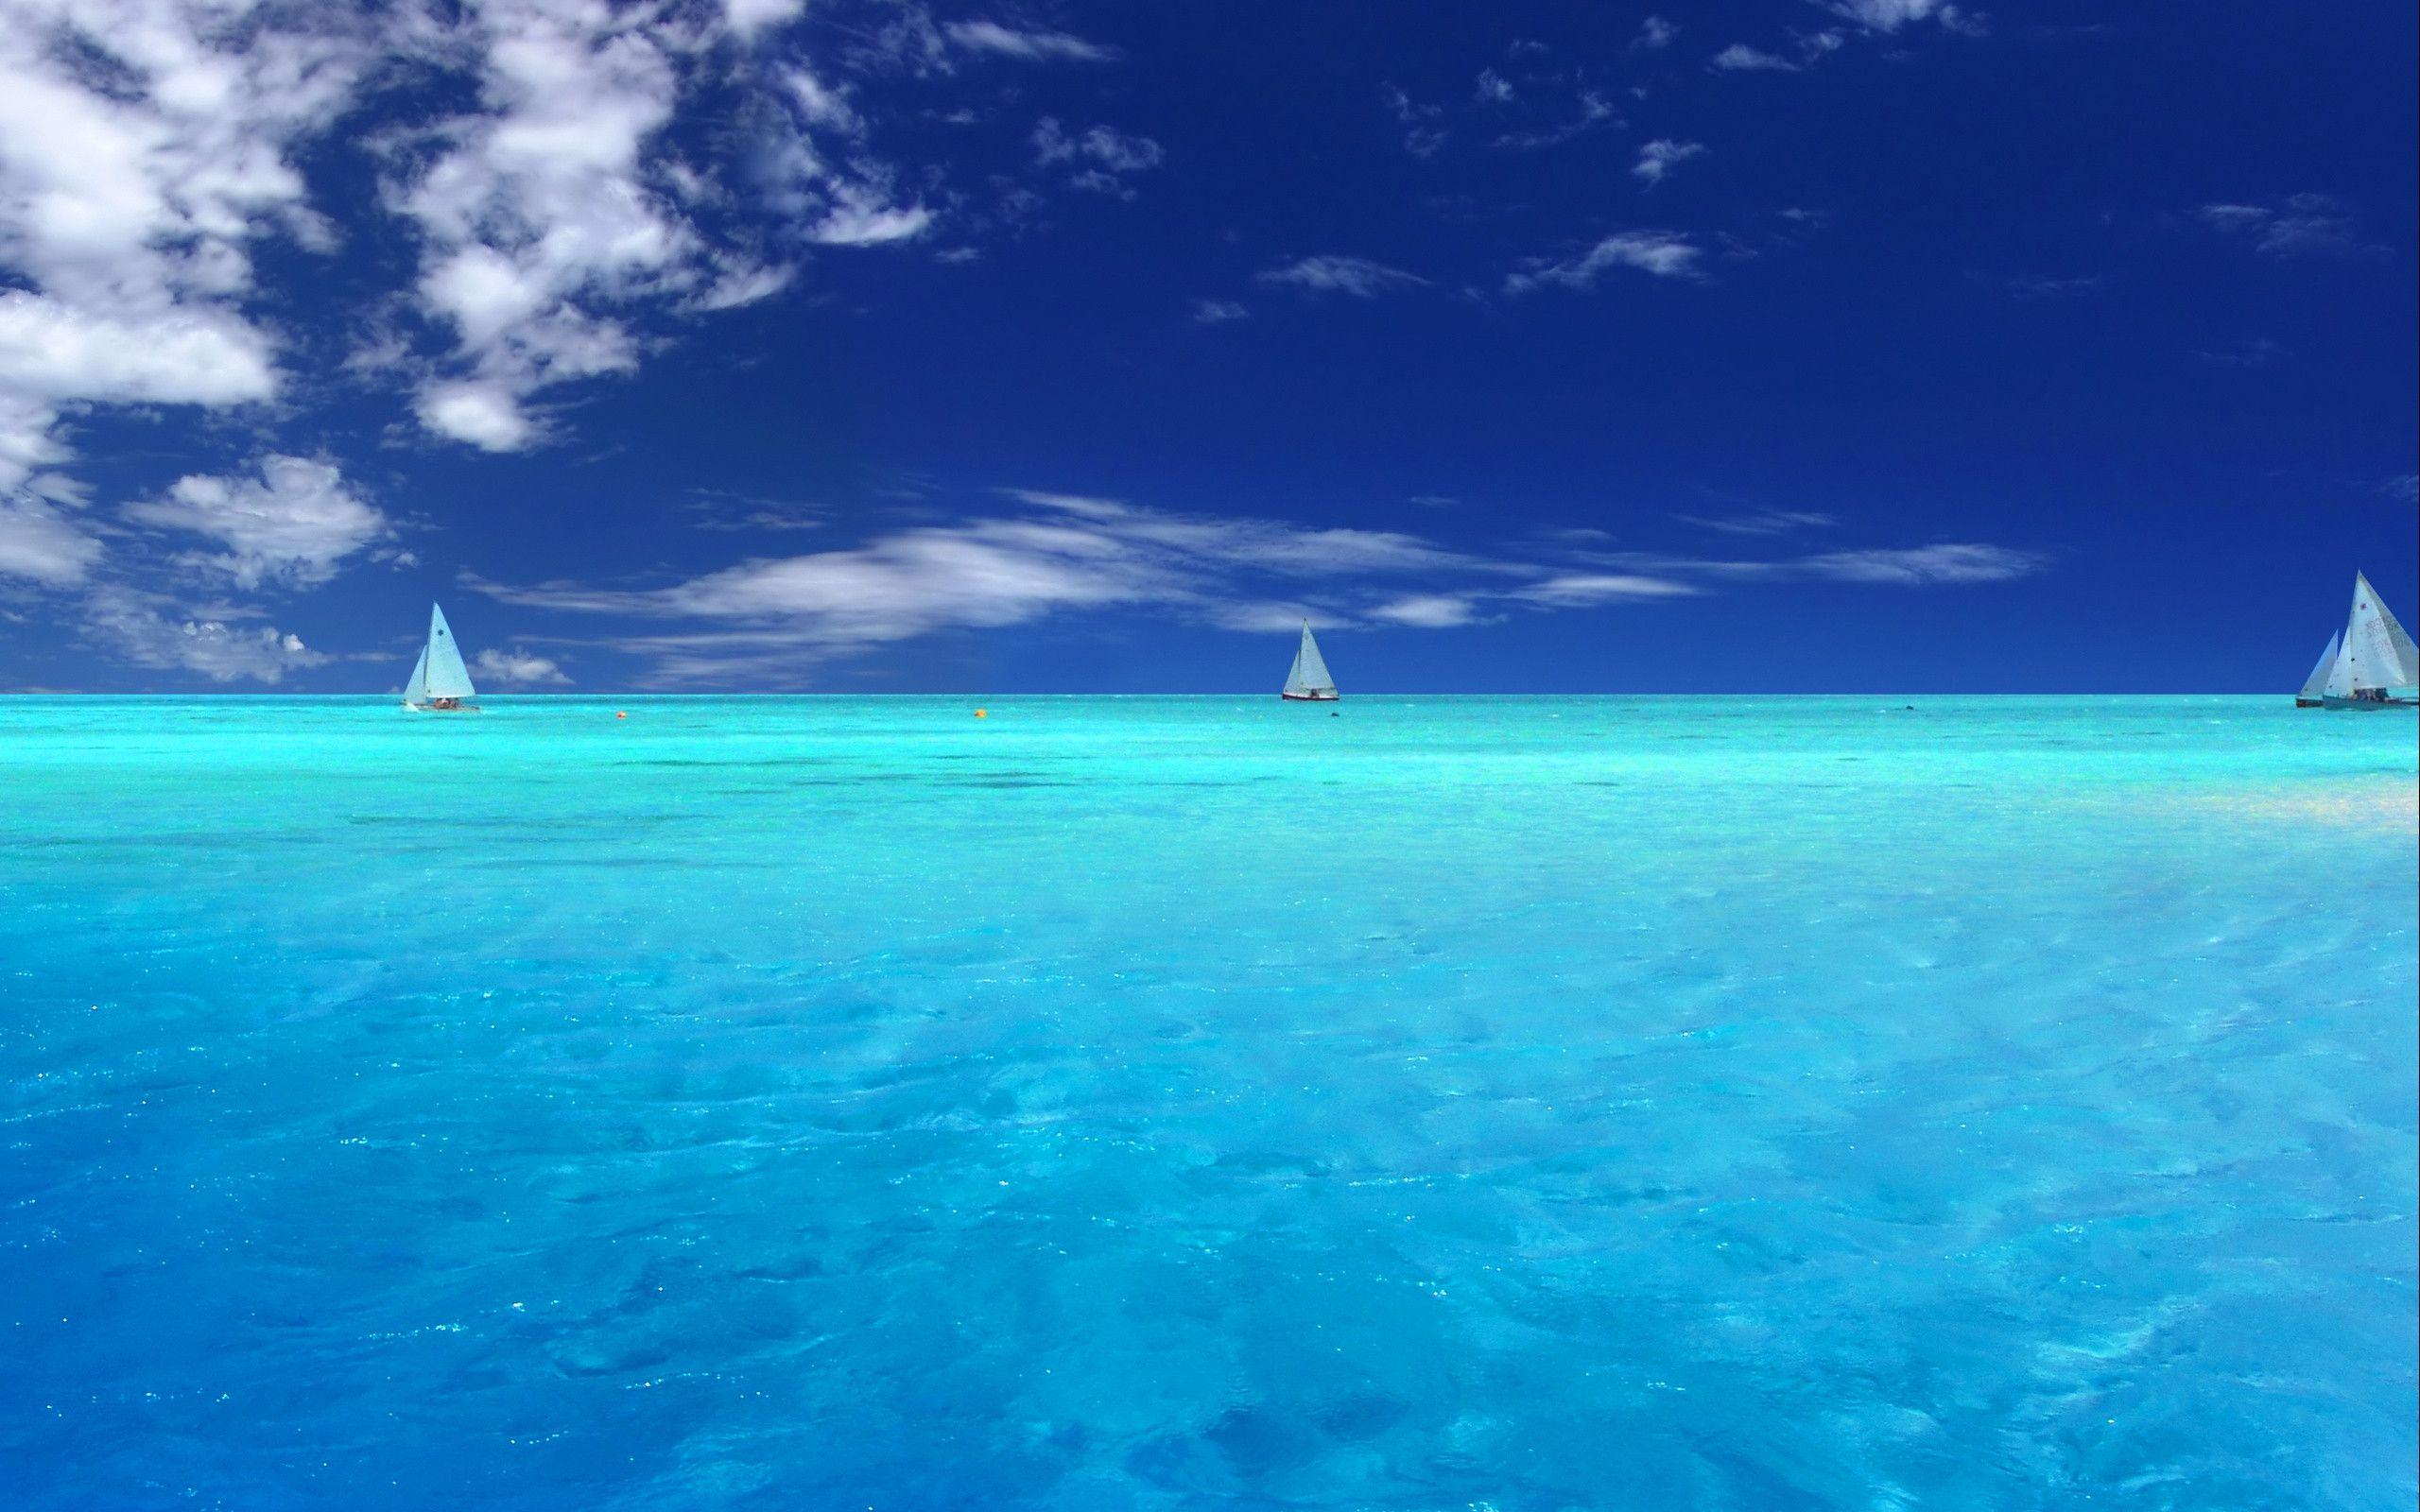 1438 ocean hd wallpapers - photo #24